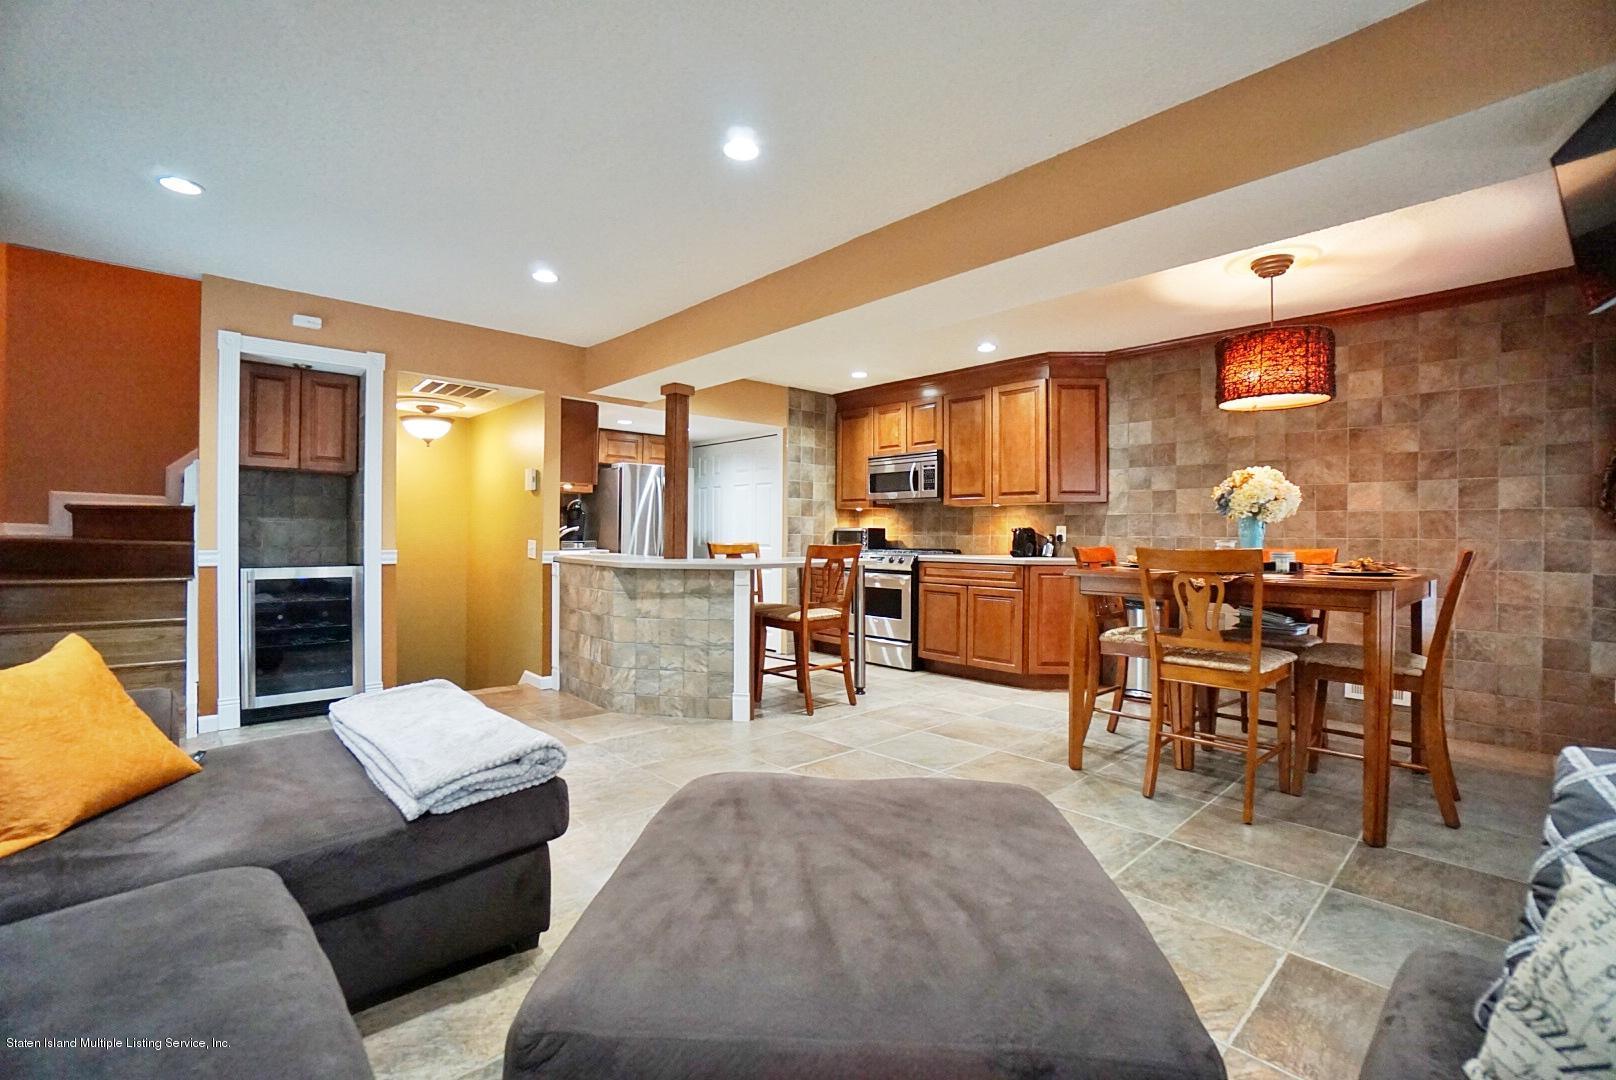 Single Family - Attached 30 Halpin Avenue  Staten Island, NY 10312, MLS-1132039-13